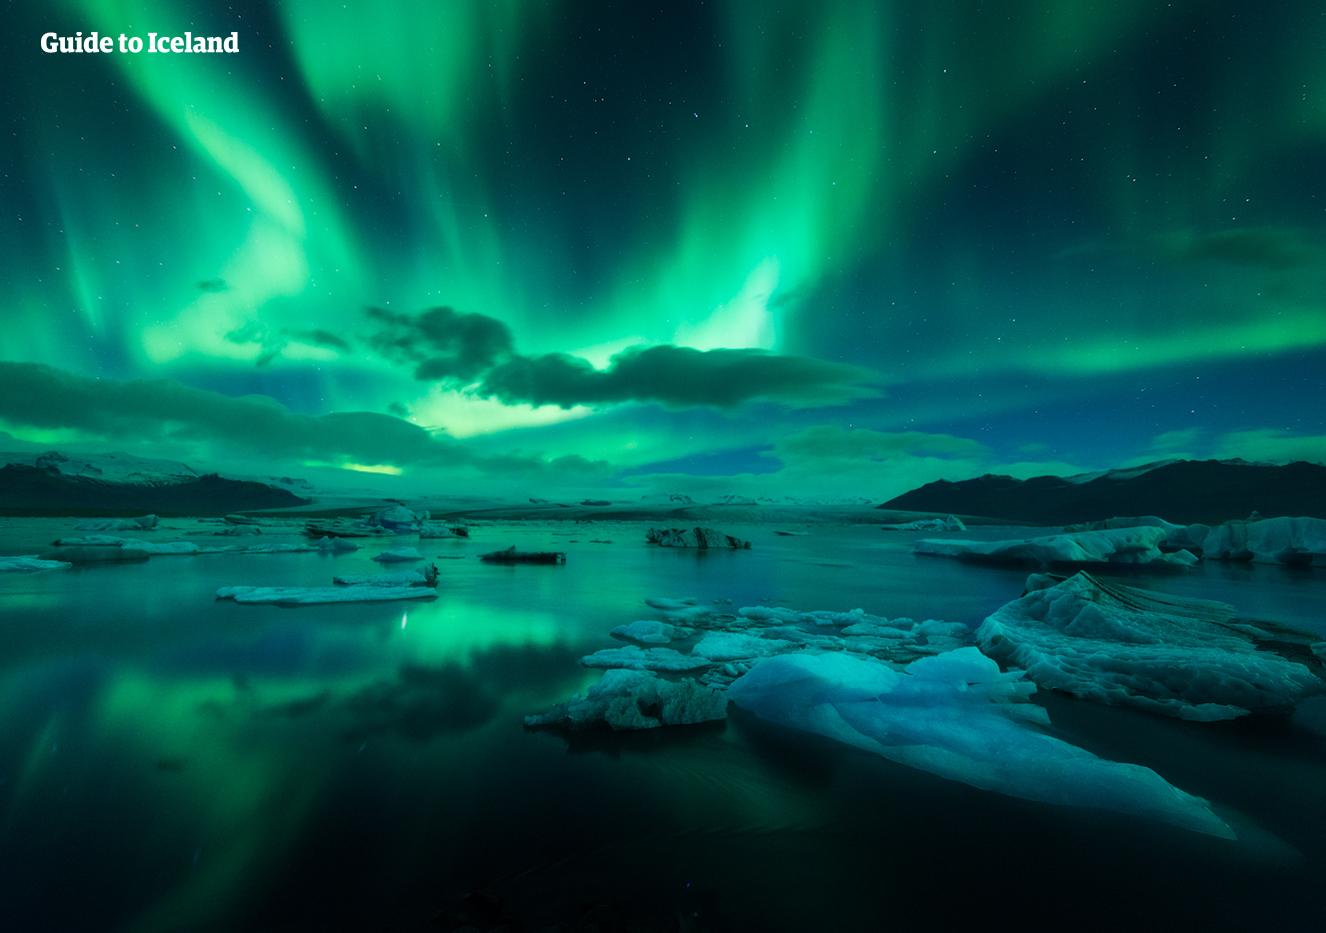 La aurora boreal sobre la laguna glaciar de Jökusárlón.